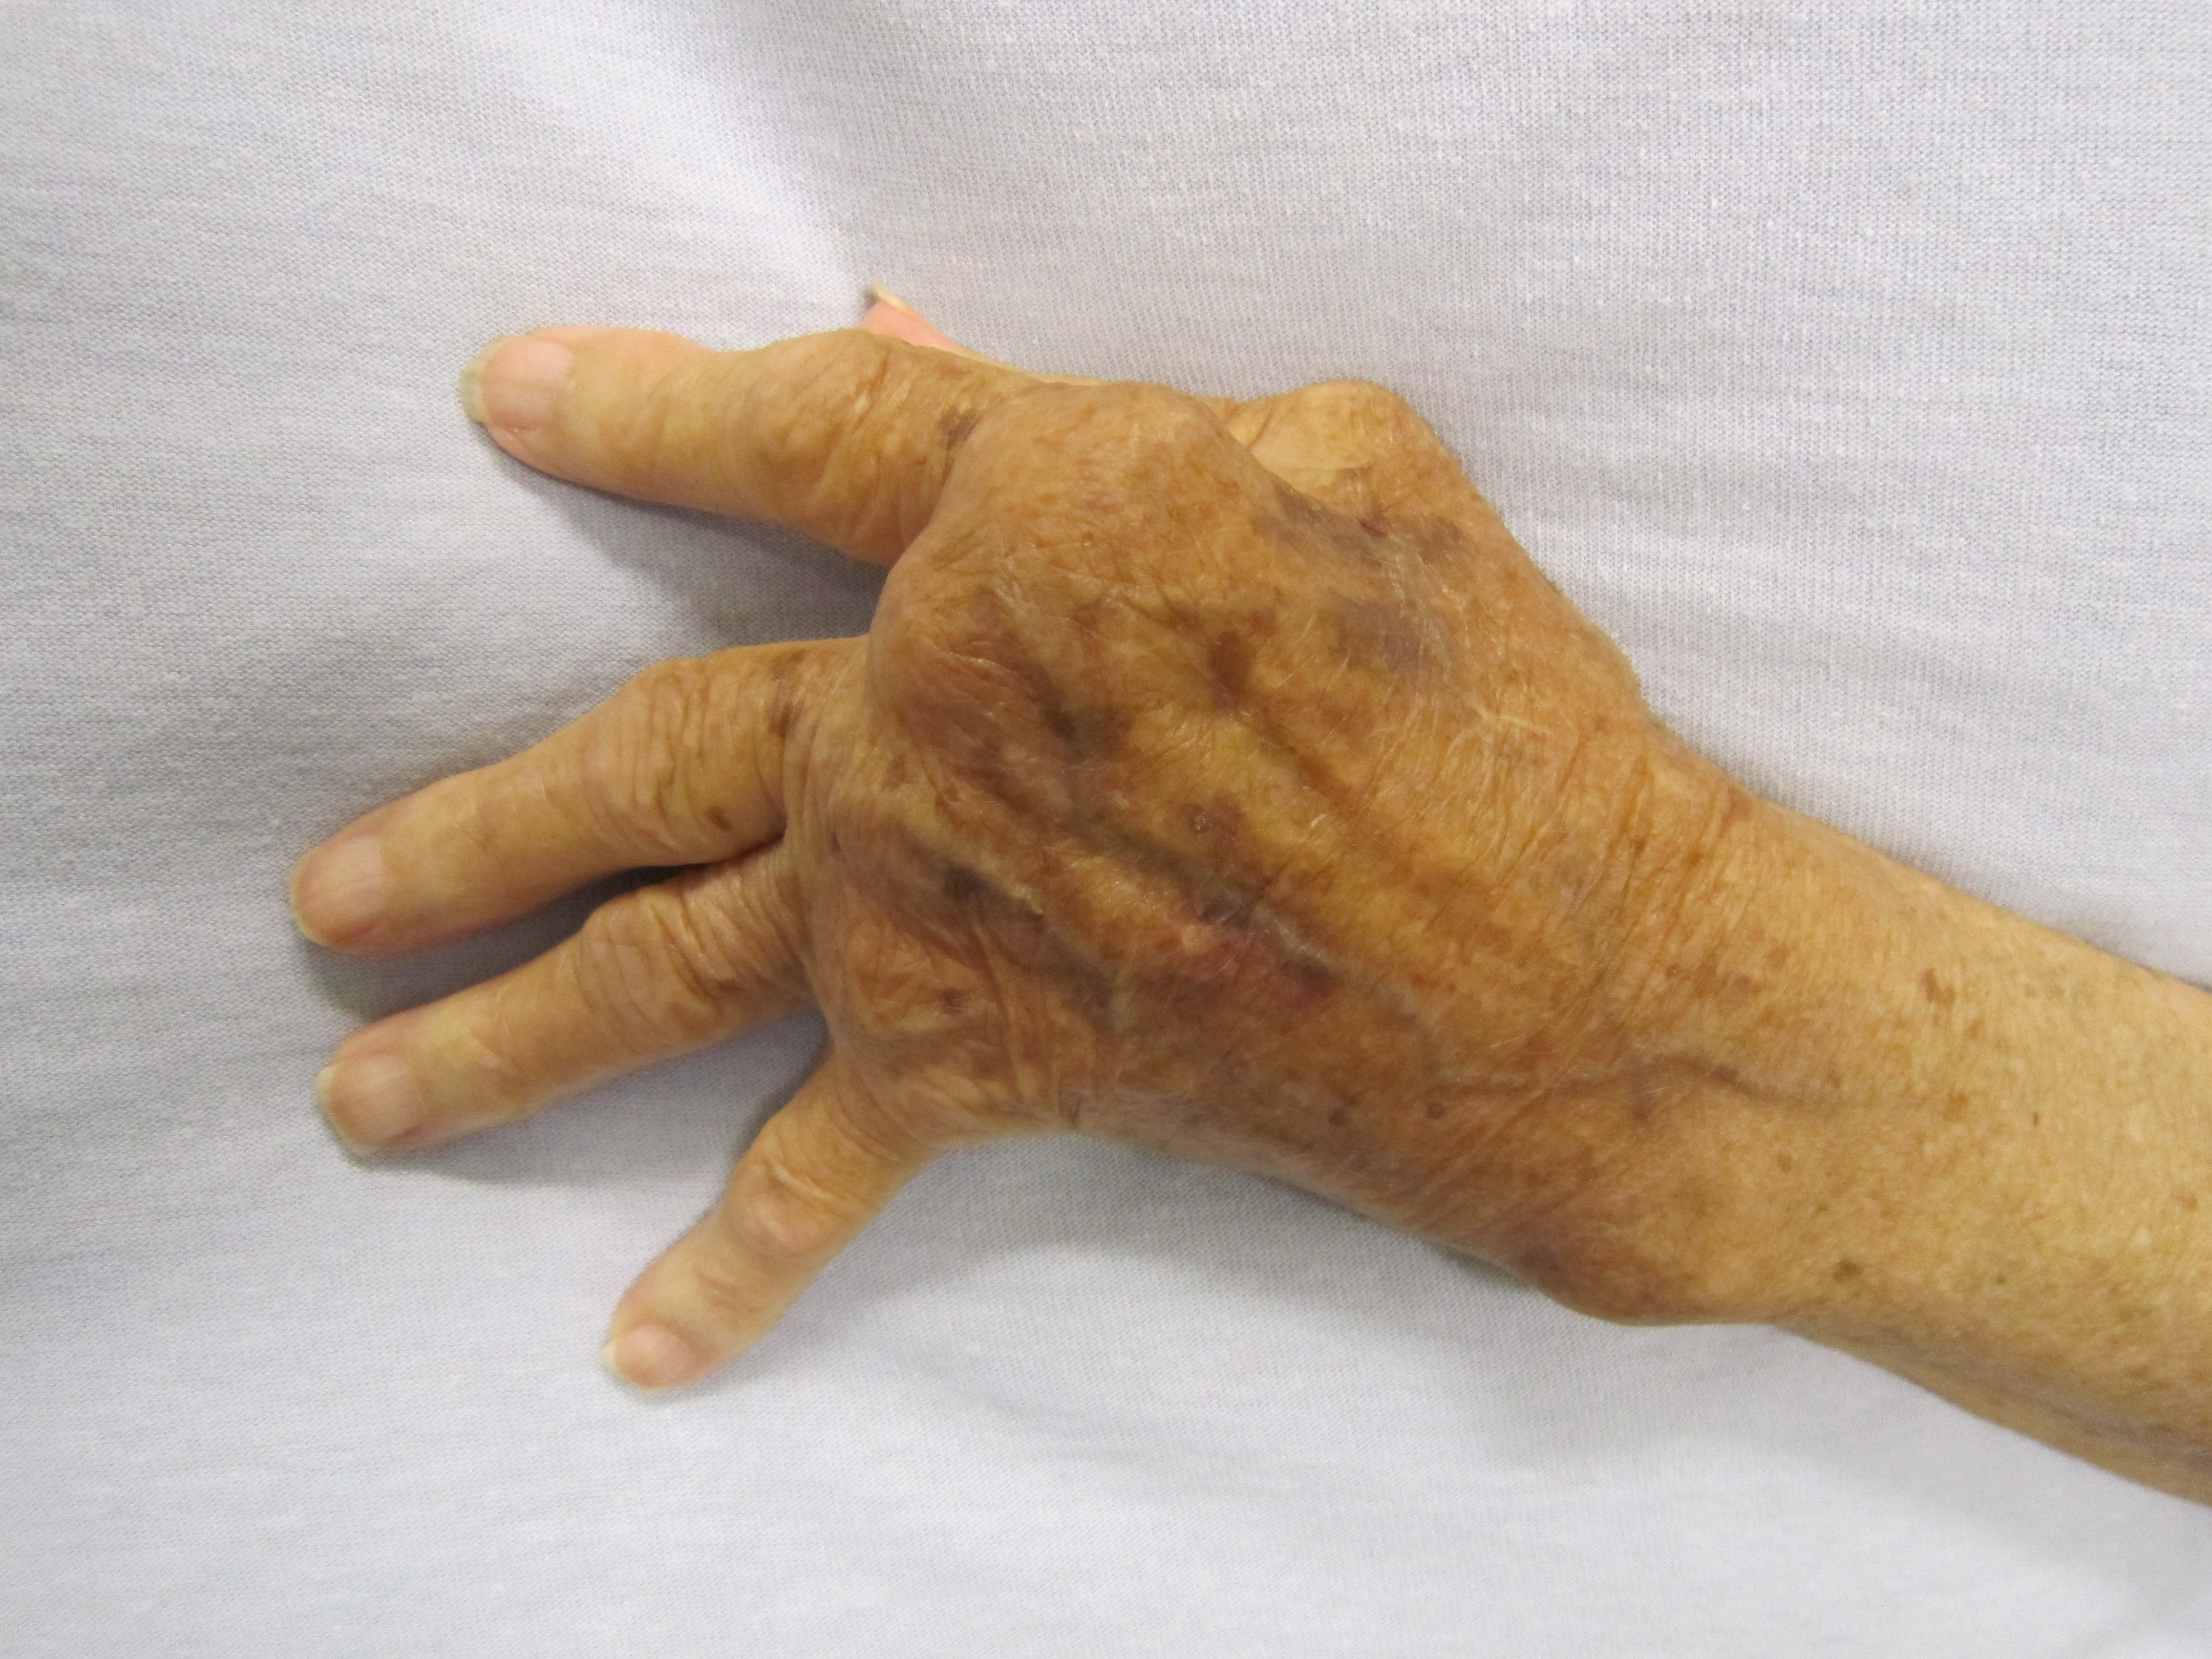 vazodilatátor gyógyszer osteochondrozishoz